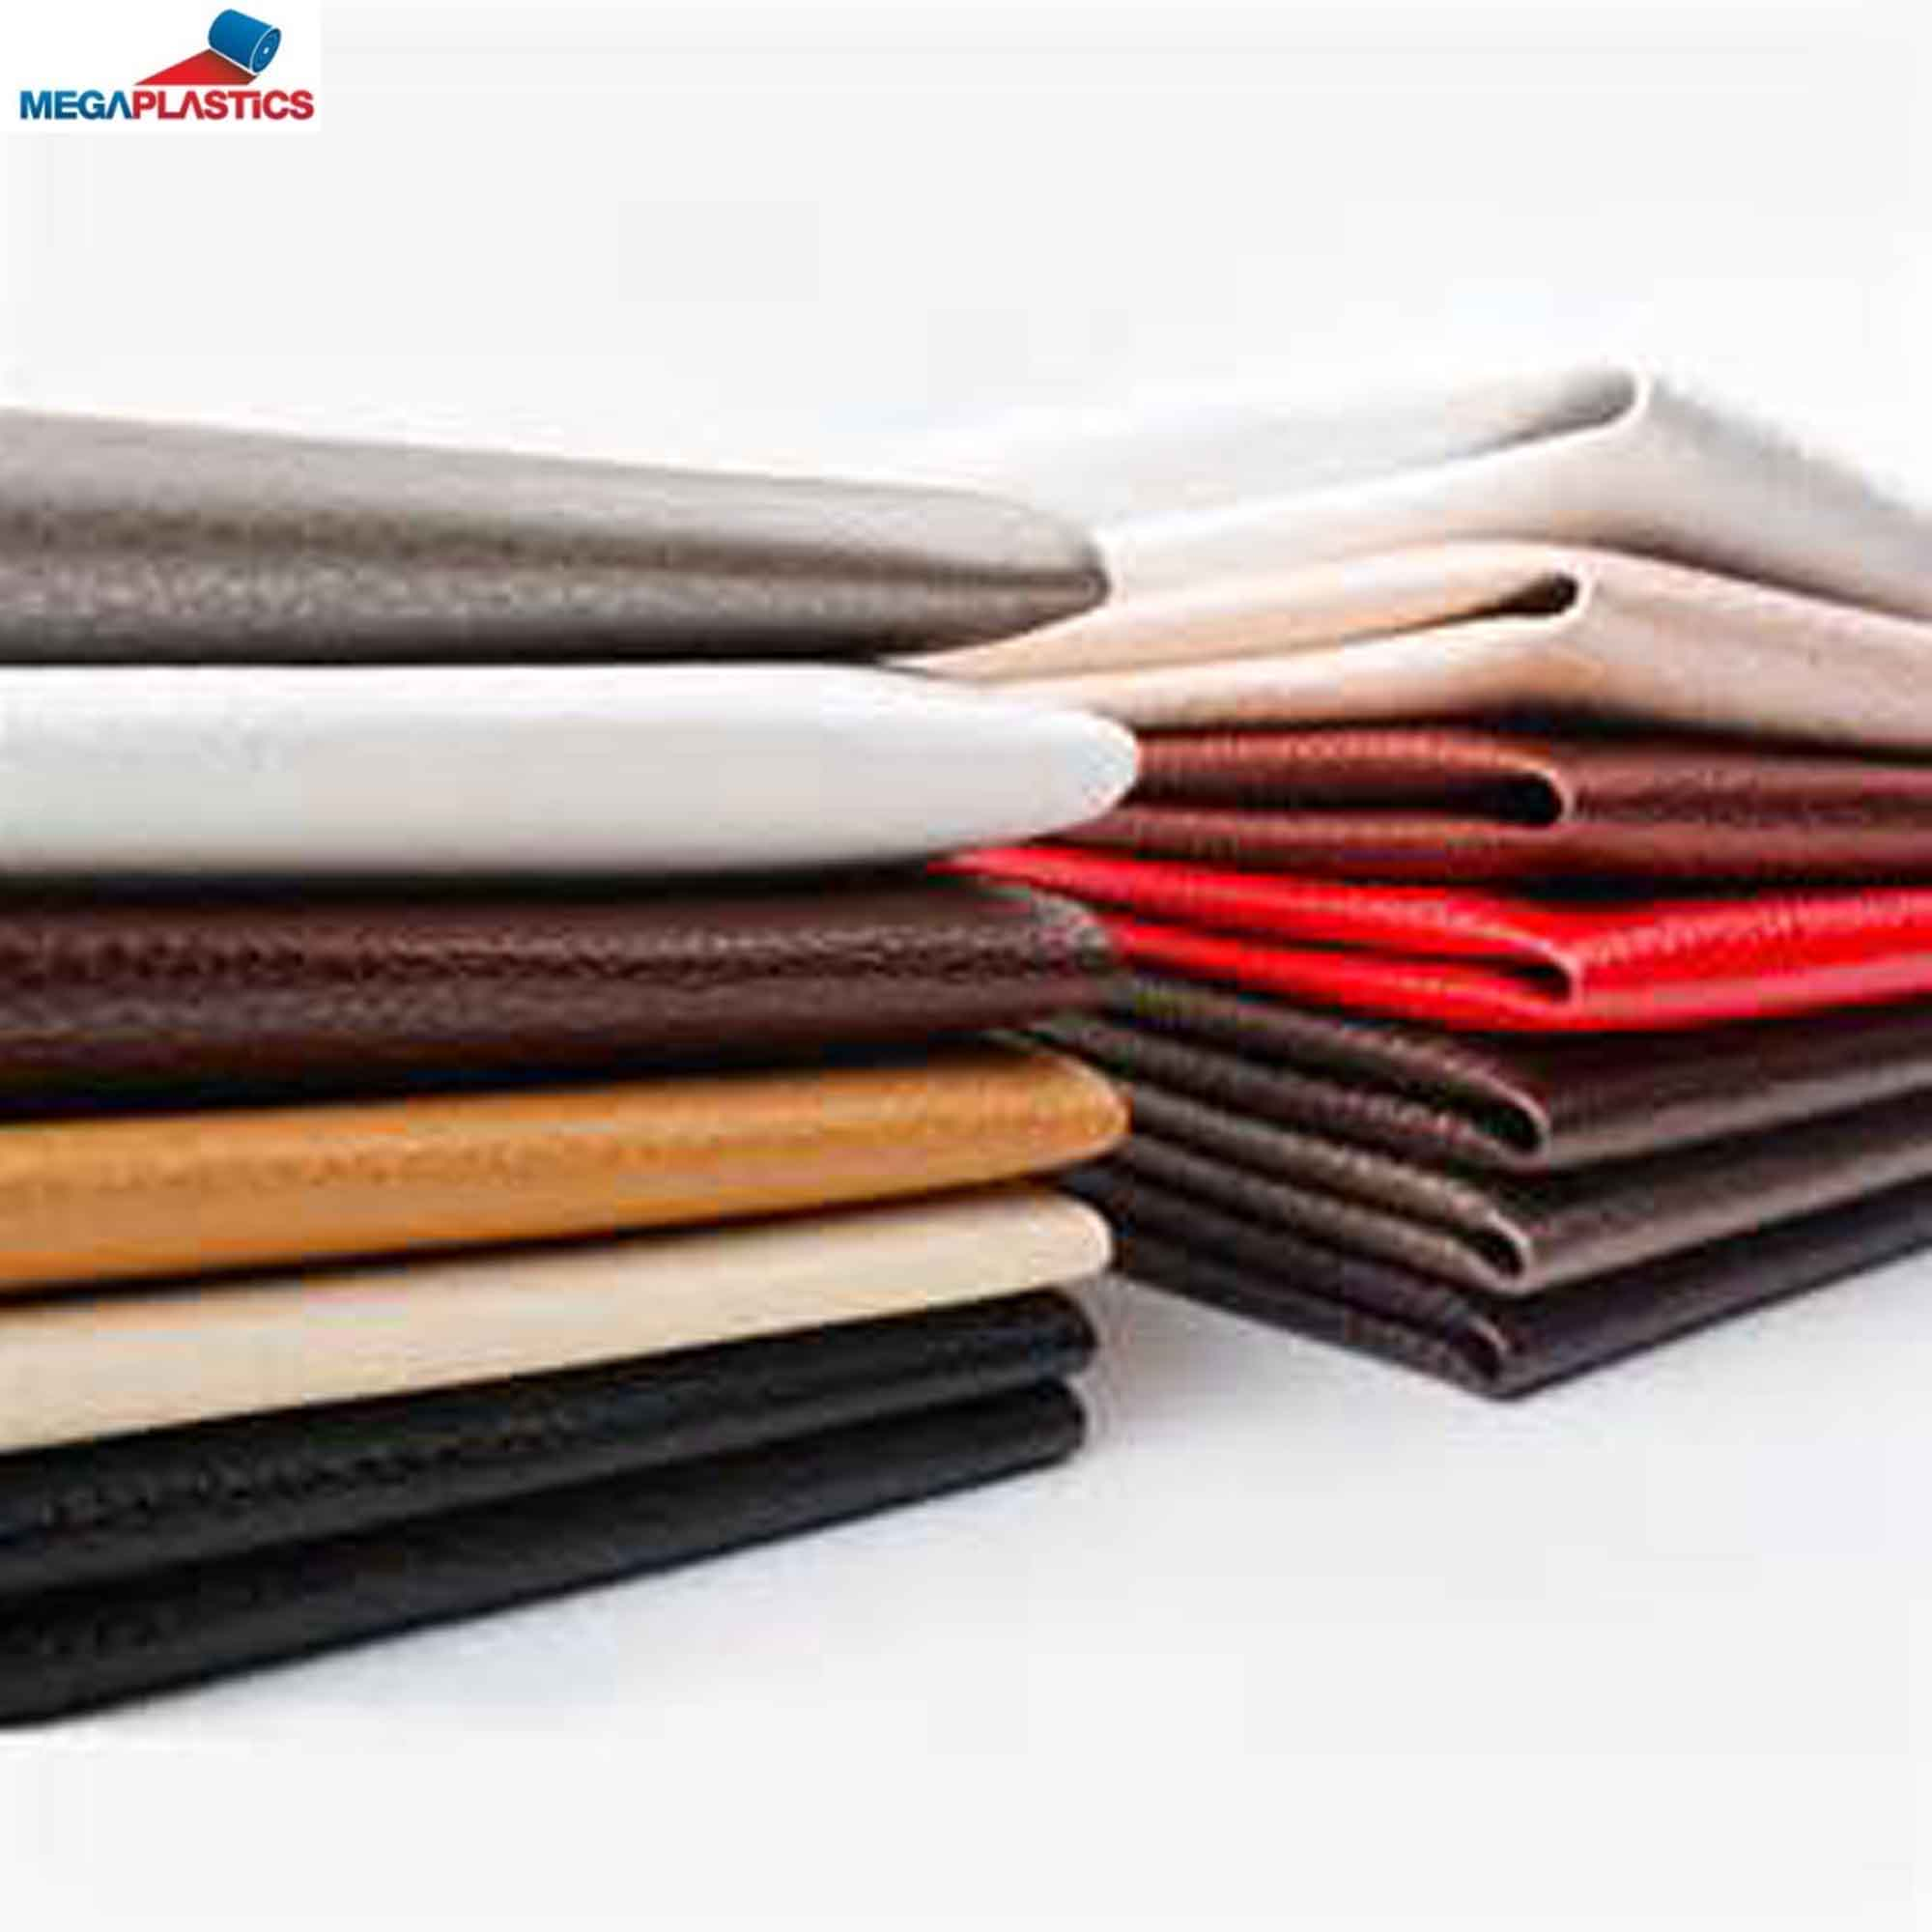 Mega plastic launch batches of New PU/PVC leather design